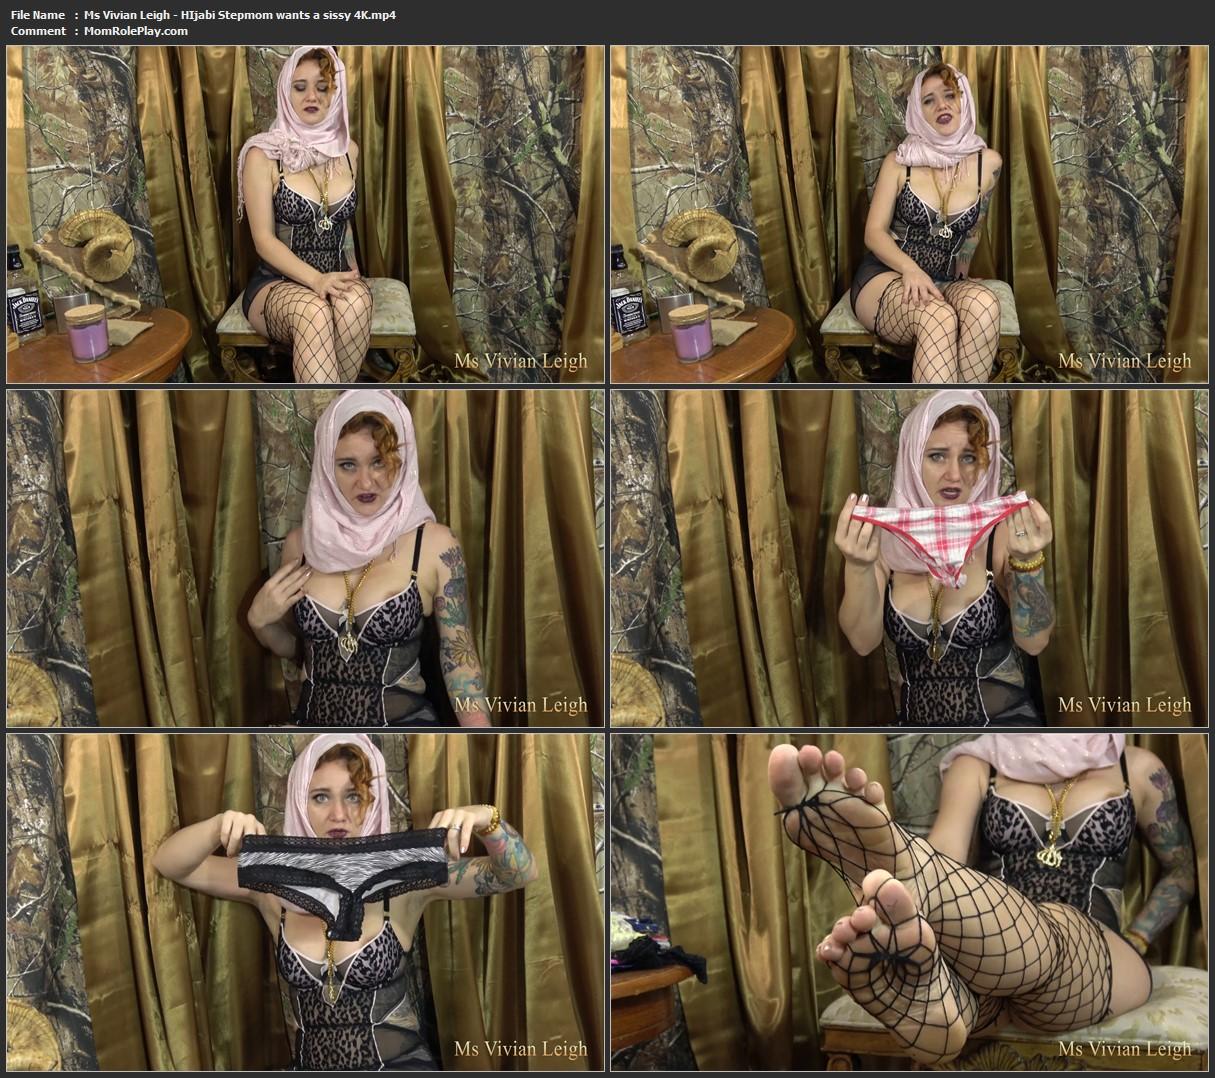 Ms Vivian Leigh - HIjabi Stepmom wants a sissy 4K